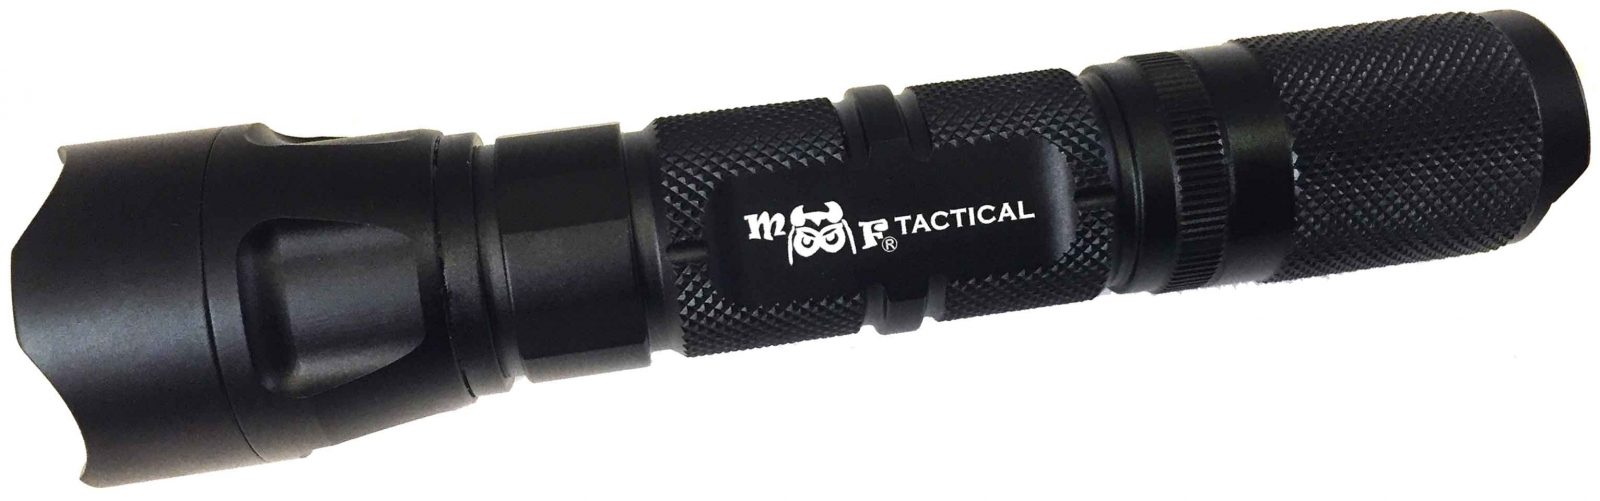 tactical illumination spec msm monkey torq light mil batch store